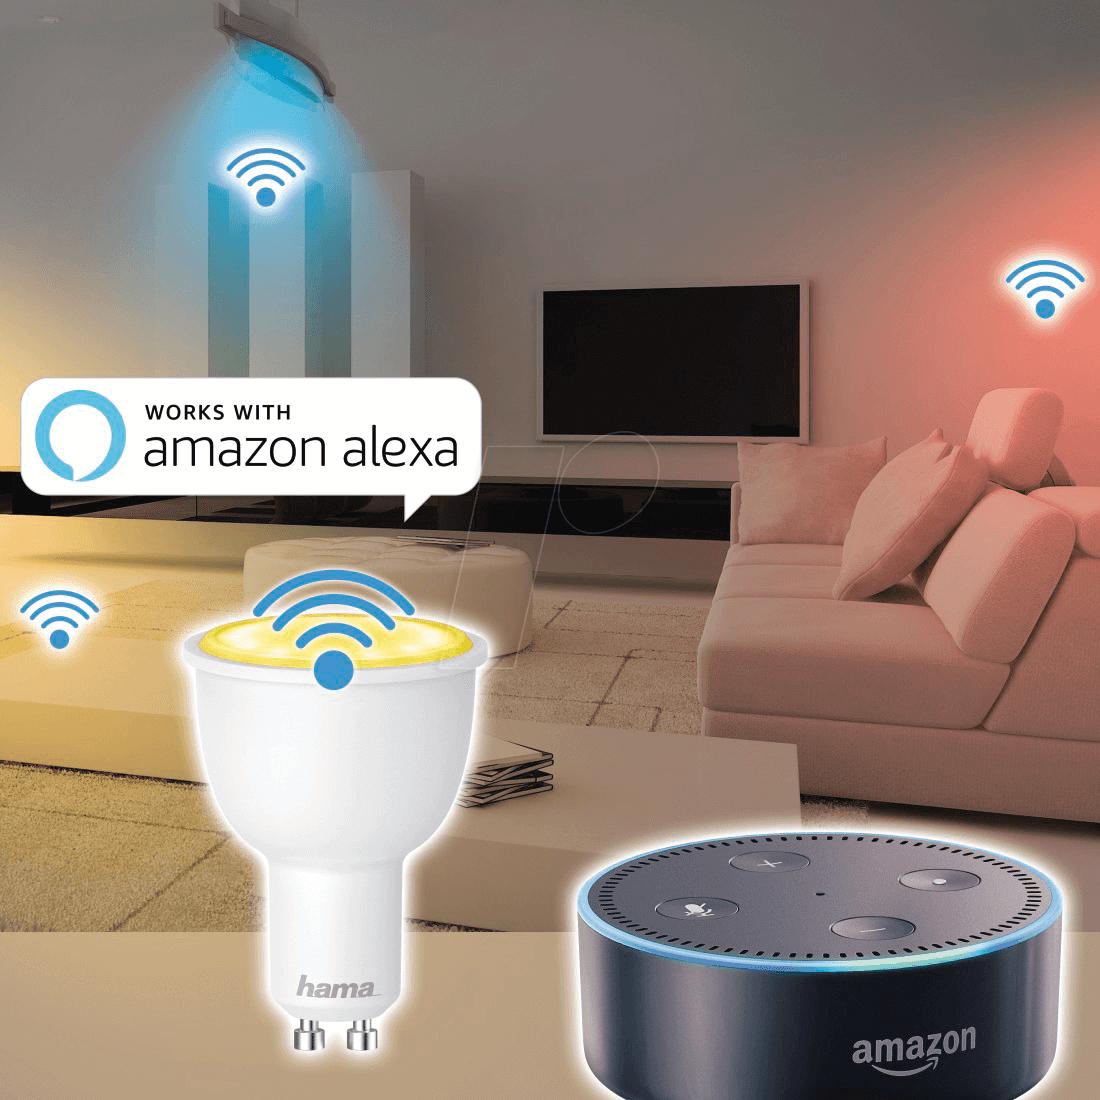 hama 176532 smart light lampe gu10 4 5w rgbw eek a wlan bei reichelt elektronik. Black Bedroom Furniture Sets. Home Design Ideas